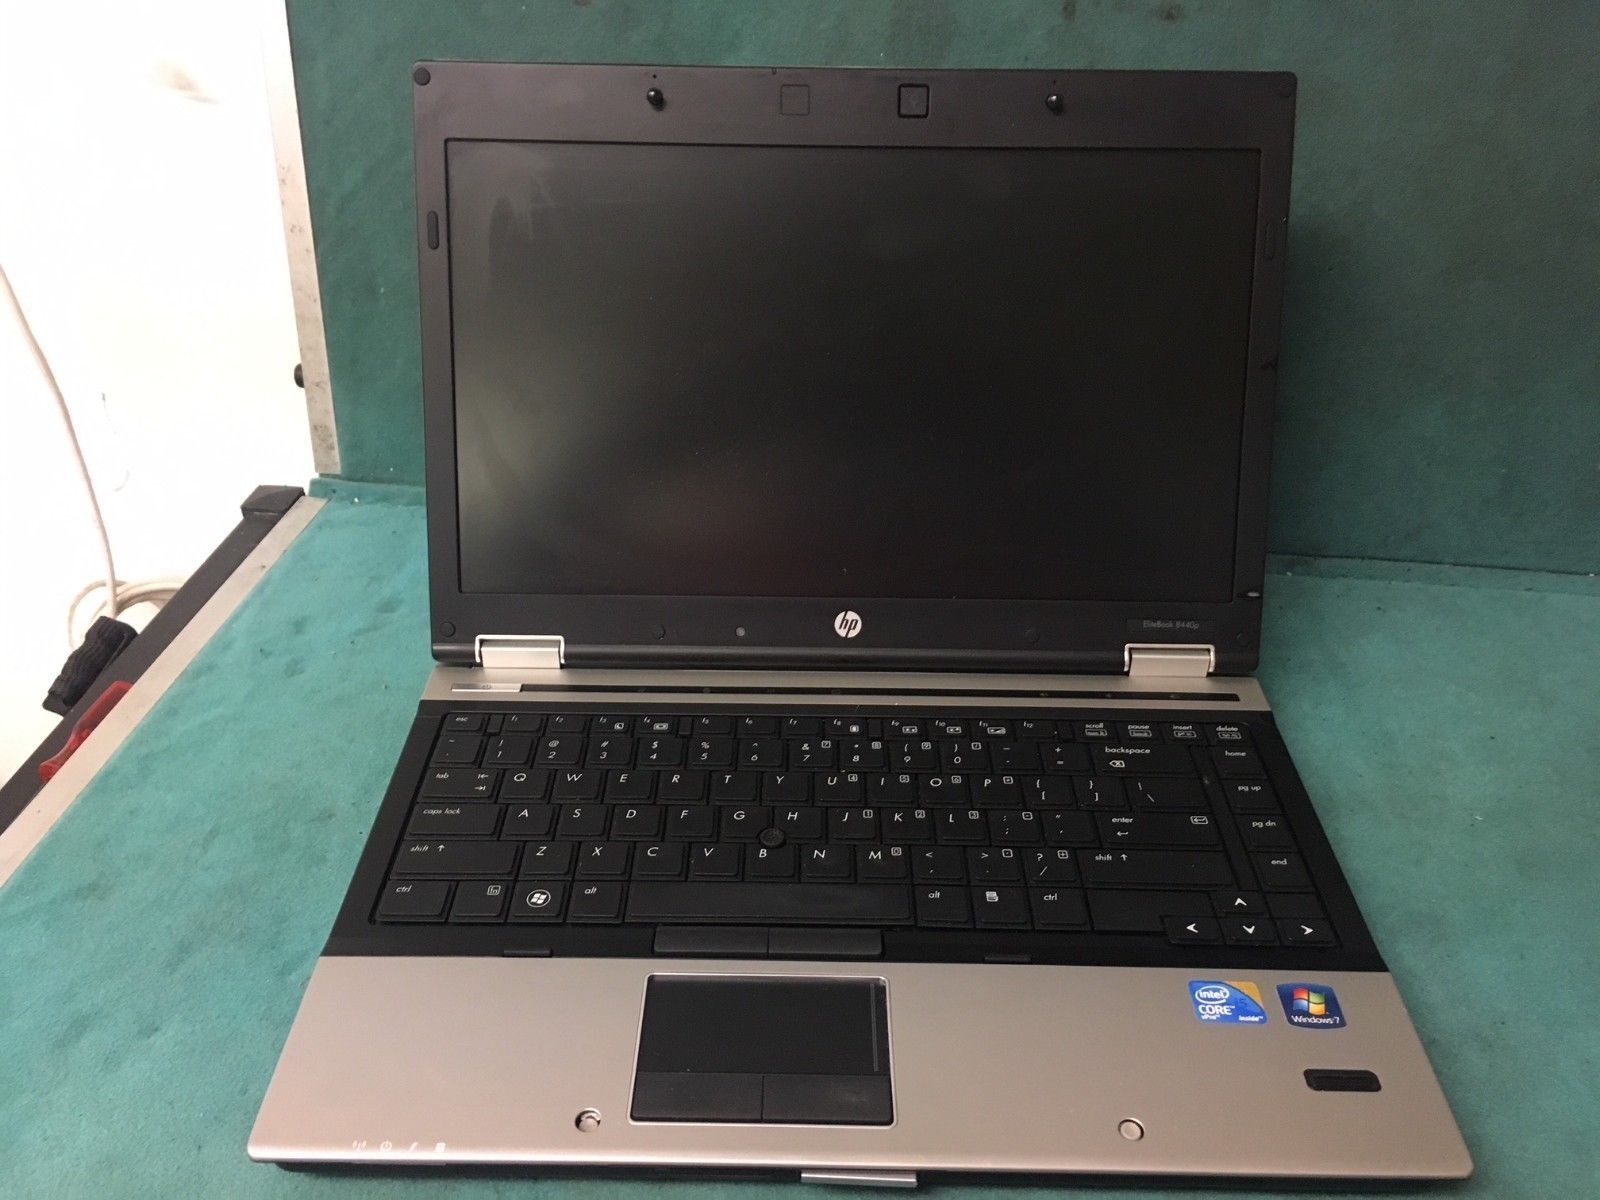 Hp elitebook 8440p laptop intel core i5 cpu m560 267 ghz 6gb hp elitebook 8440p laptop intel core i5 cpu m560 267 ghz 6gb ram publicscrutiny Image collections